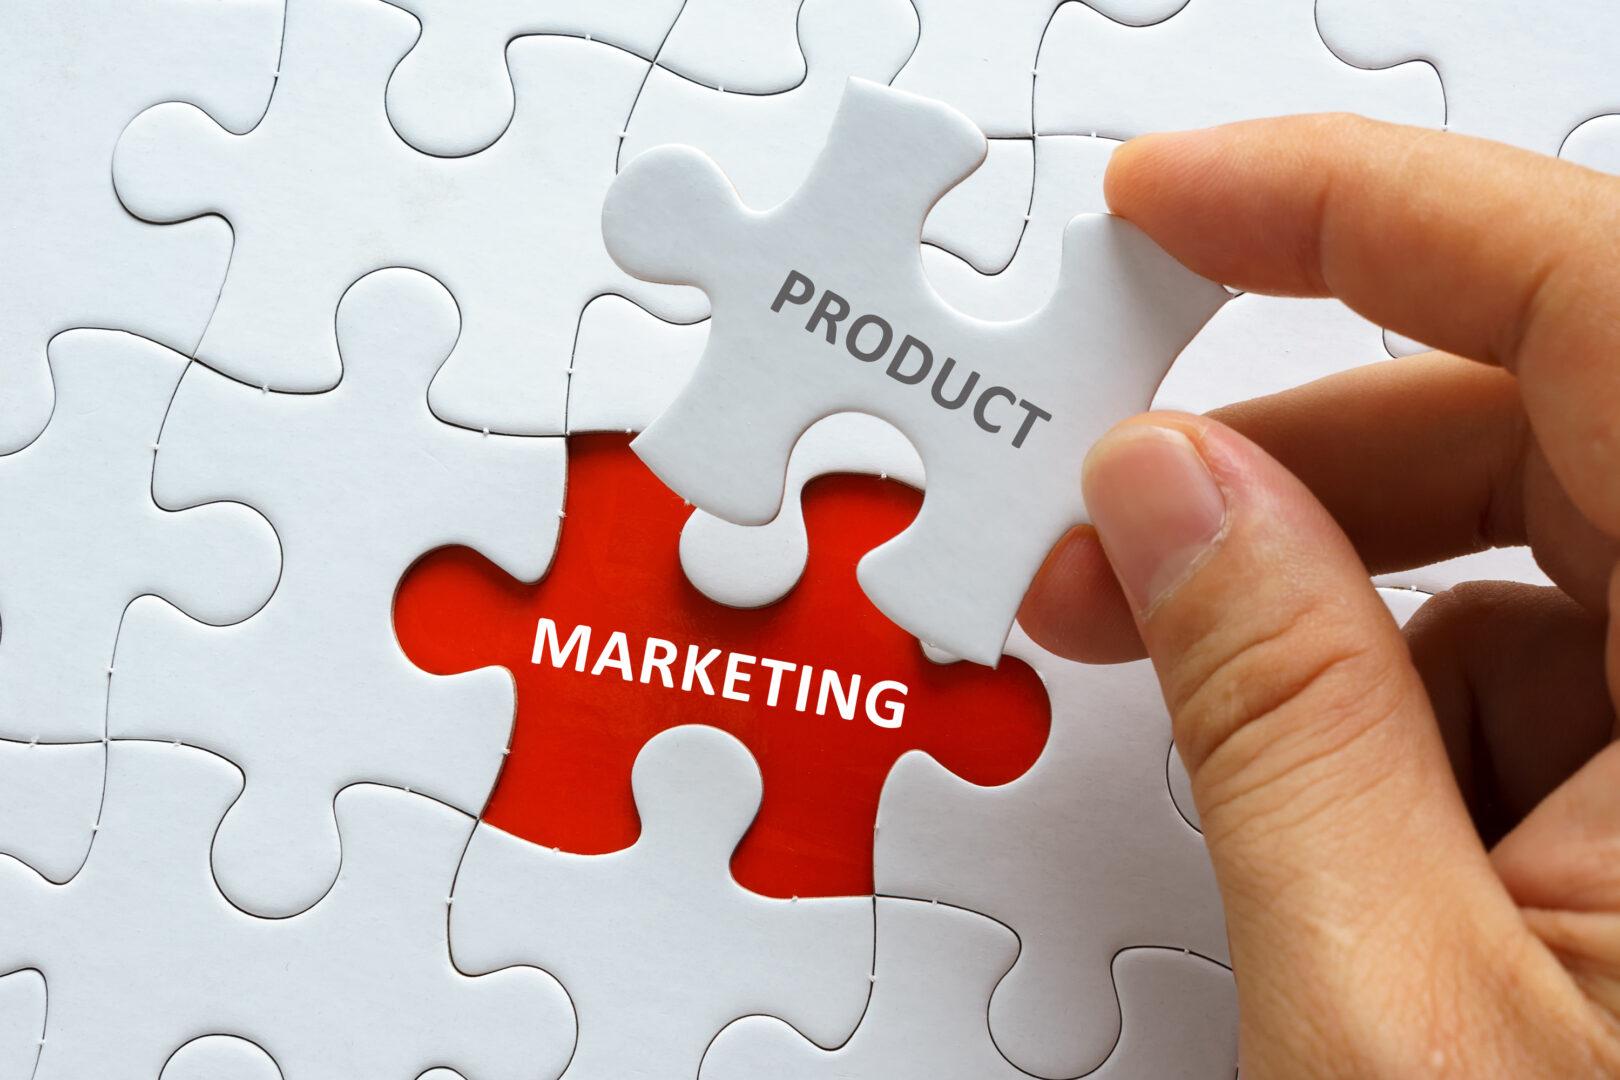 product - marketing mix